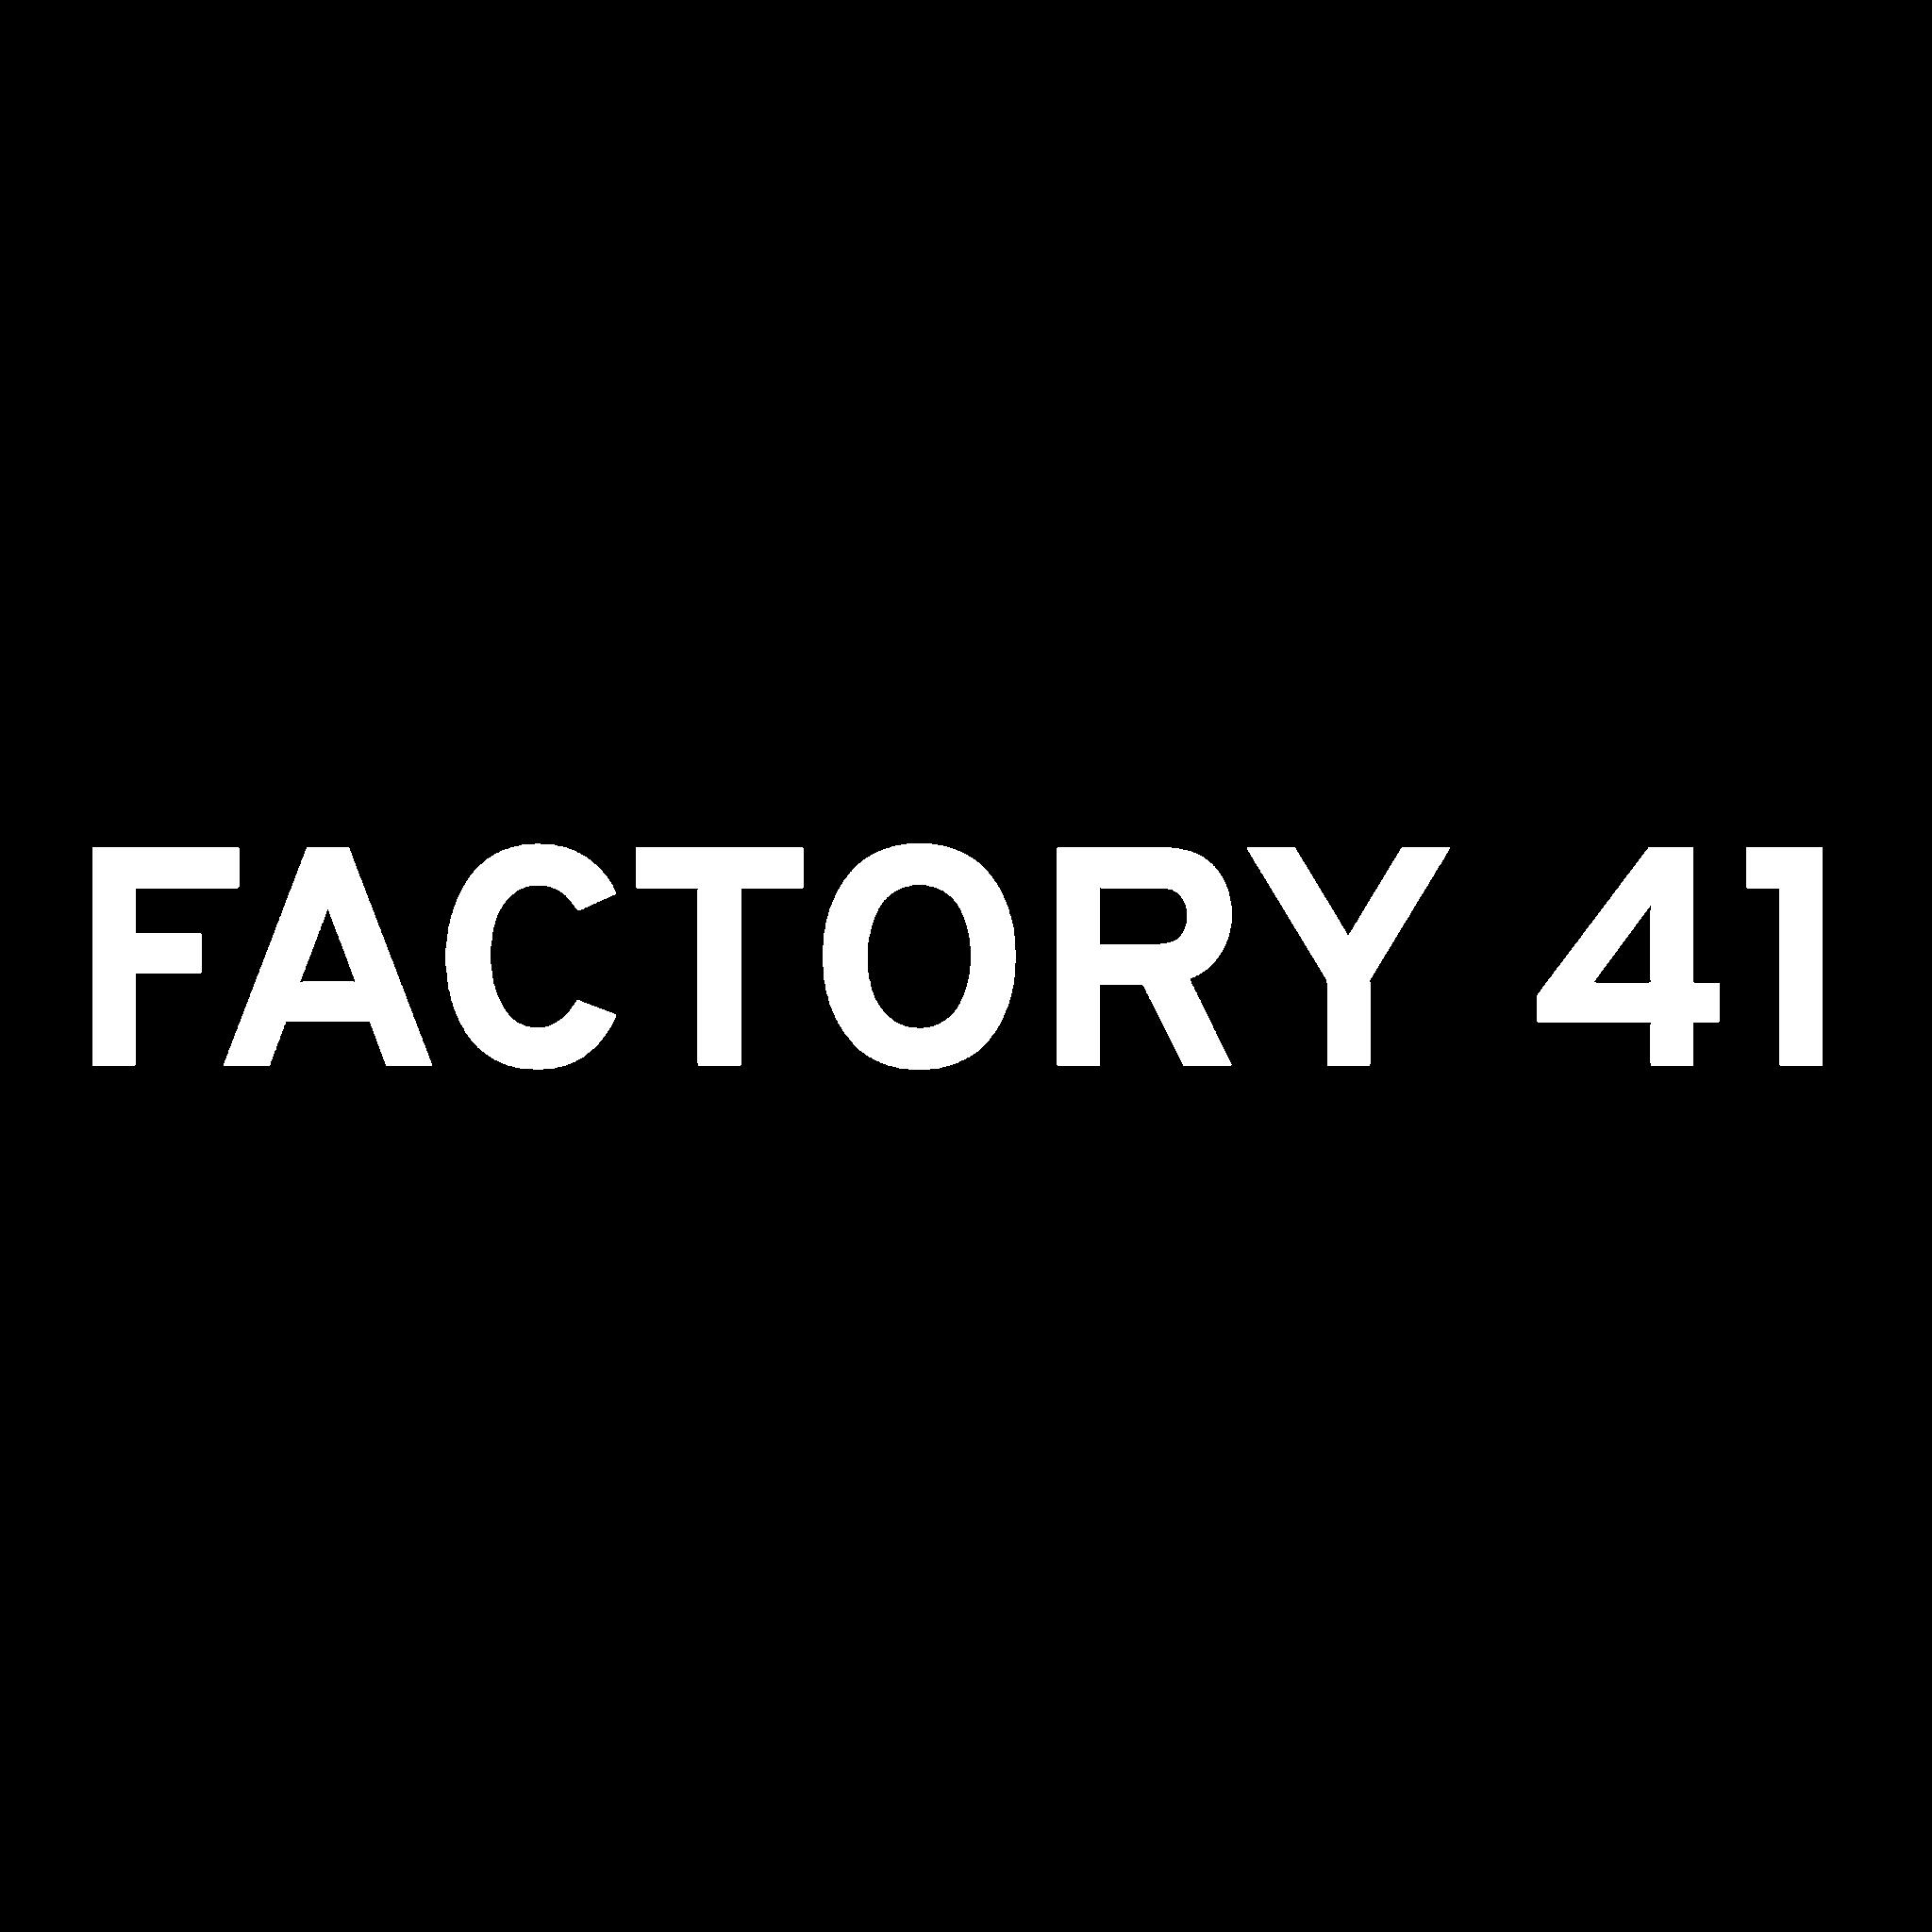 Factory 41